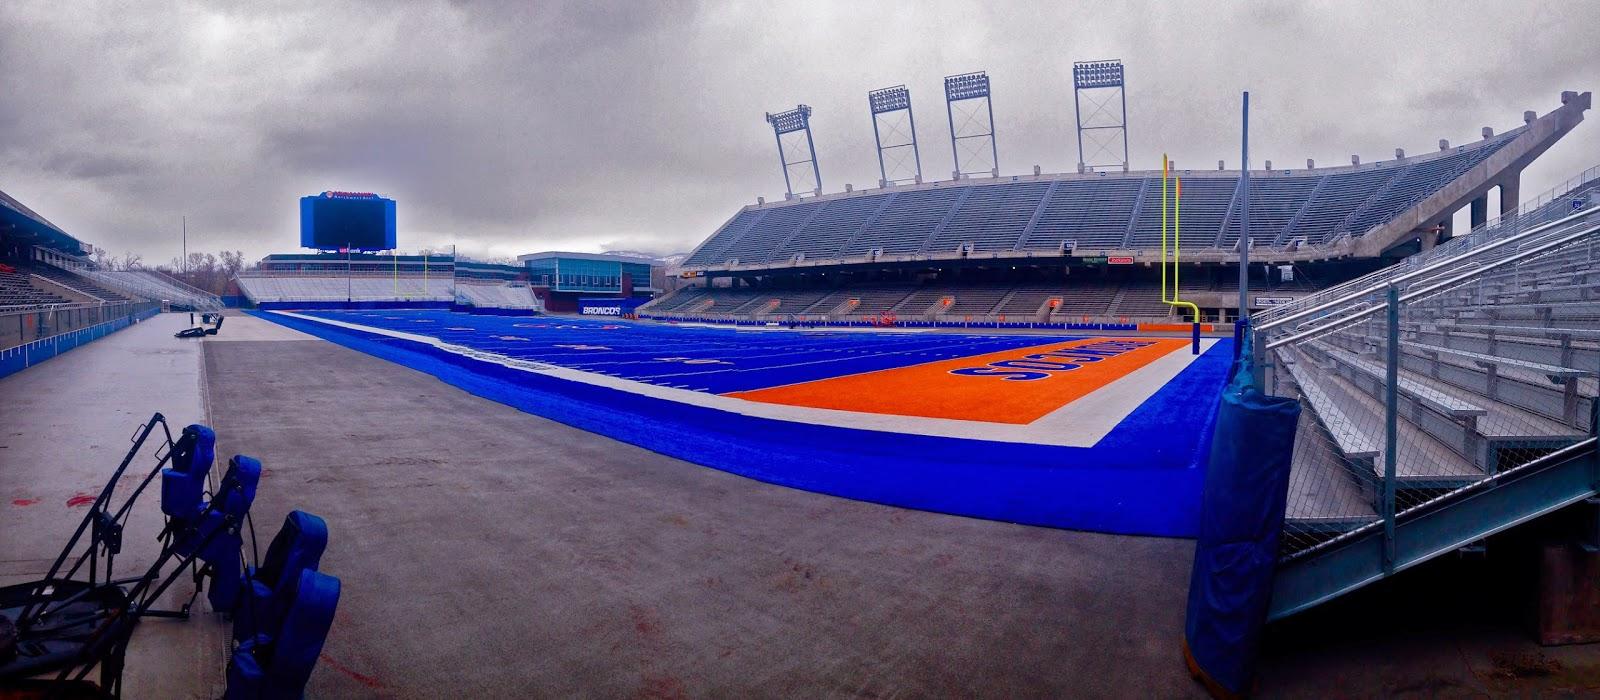 Boise state university, bsu, bronco field, boise, idaho, blue and orange, broncos, stadium, blue turf, smurf turf, football field, boise state football, natalie craig